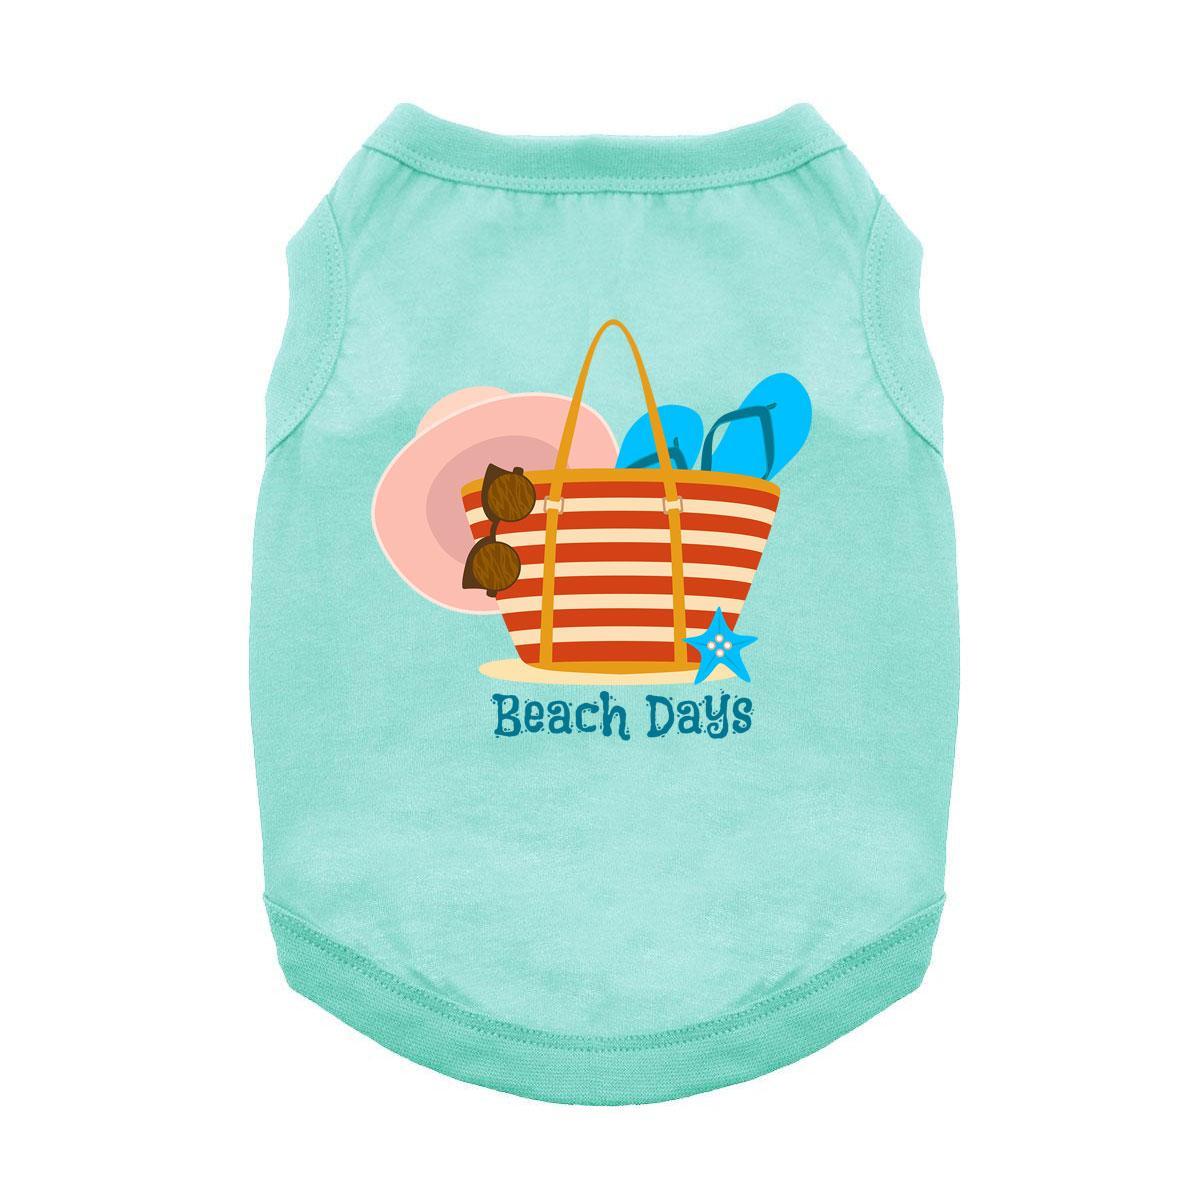 Beach Days Dog Shirt - Teal